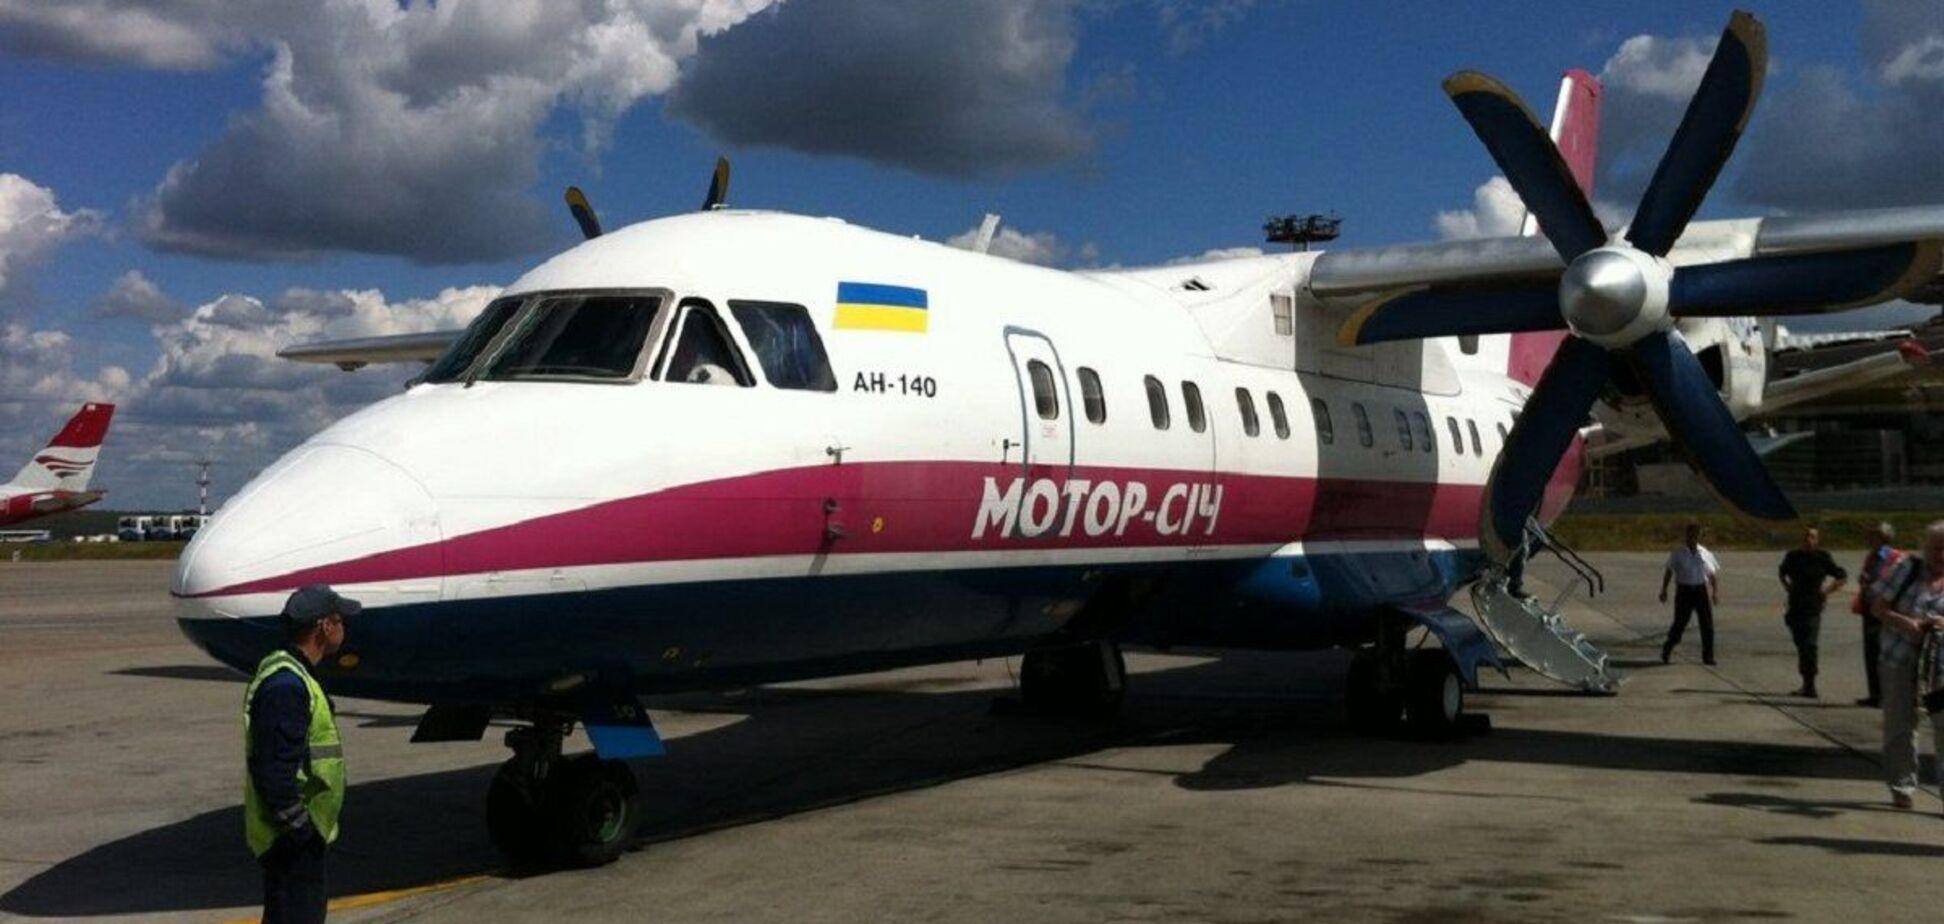 За співпрацю з ПАТ 'Мотор Січ' Україну можуть оштрафувати на $3,5 млрд